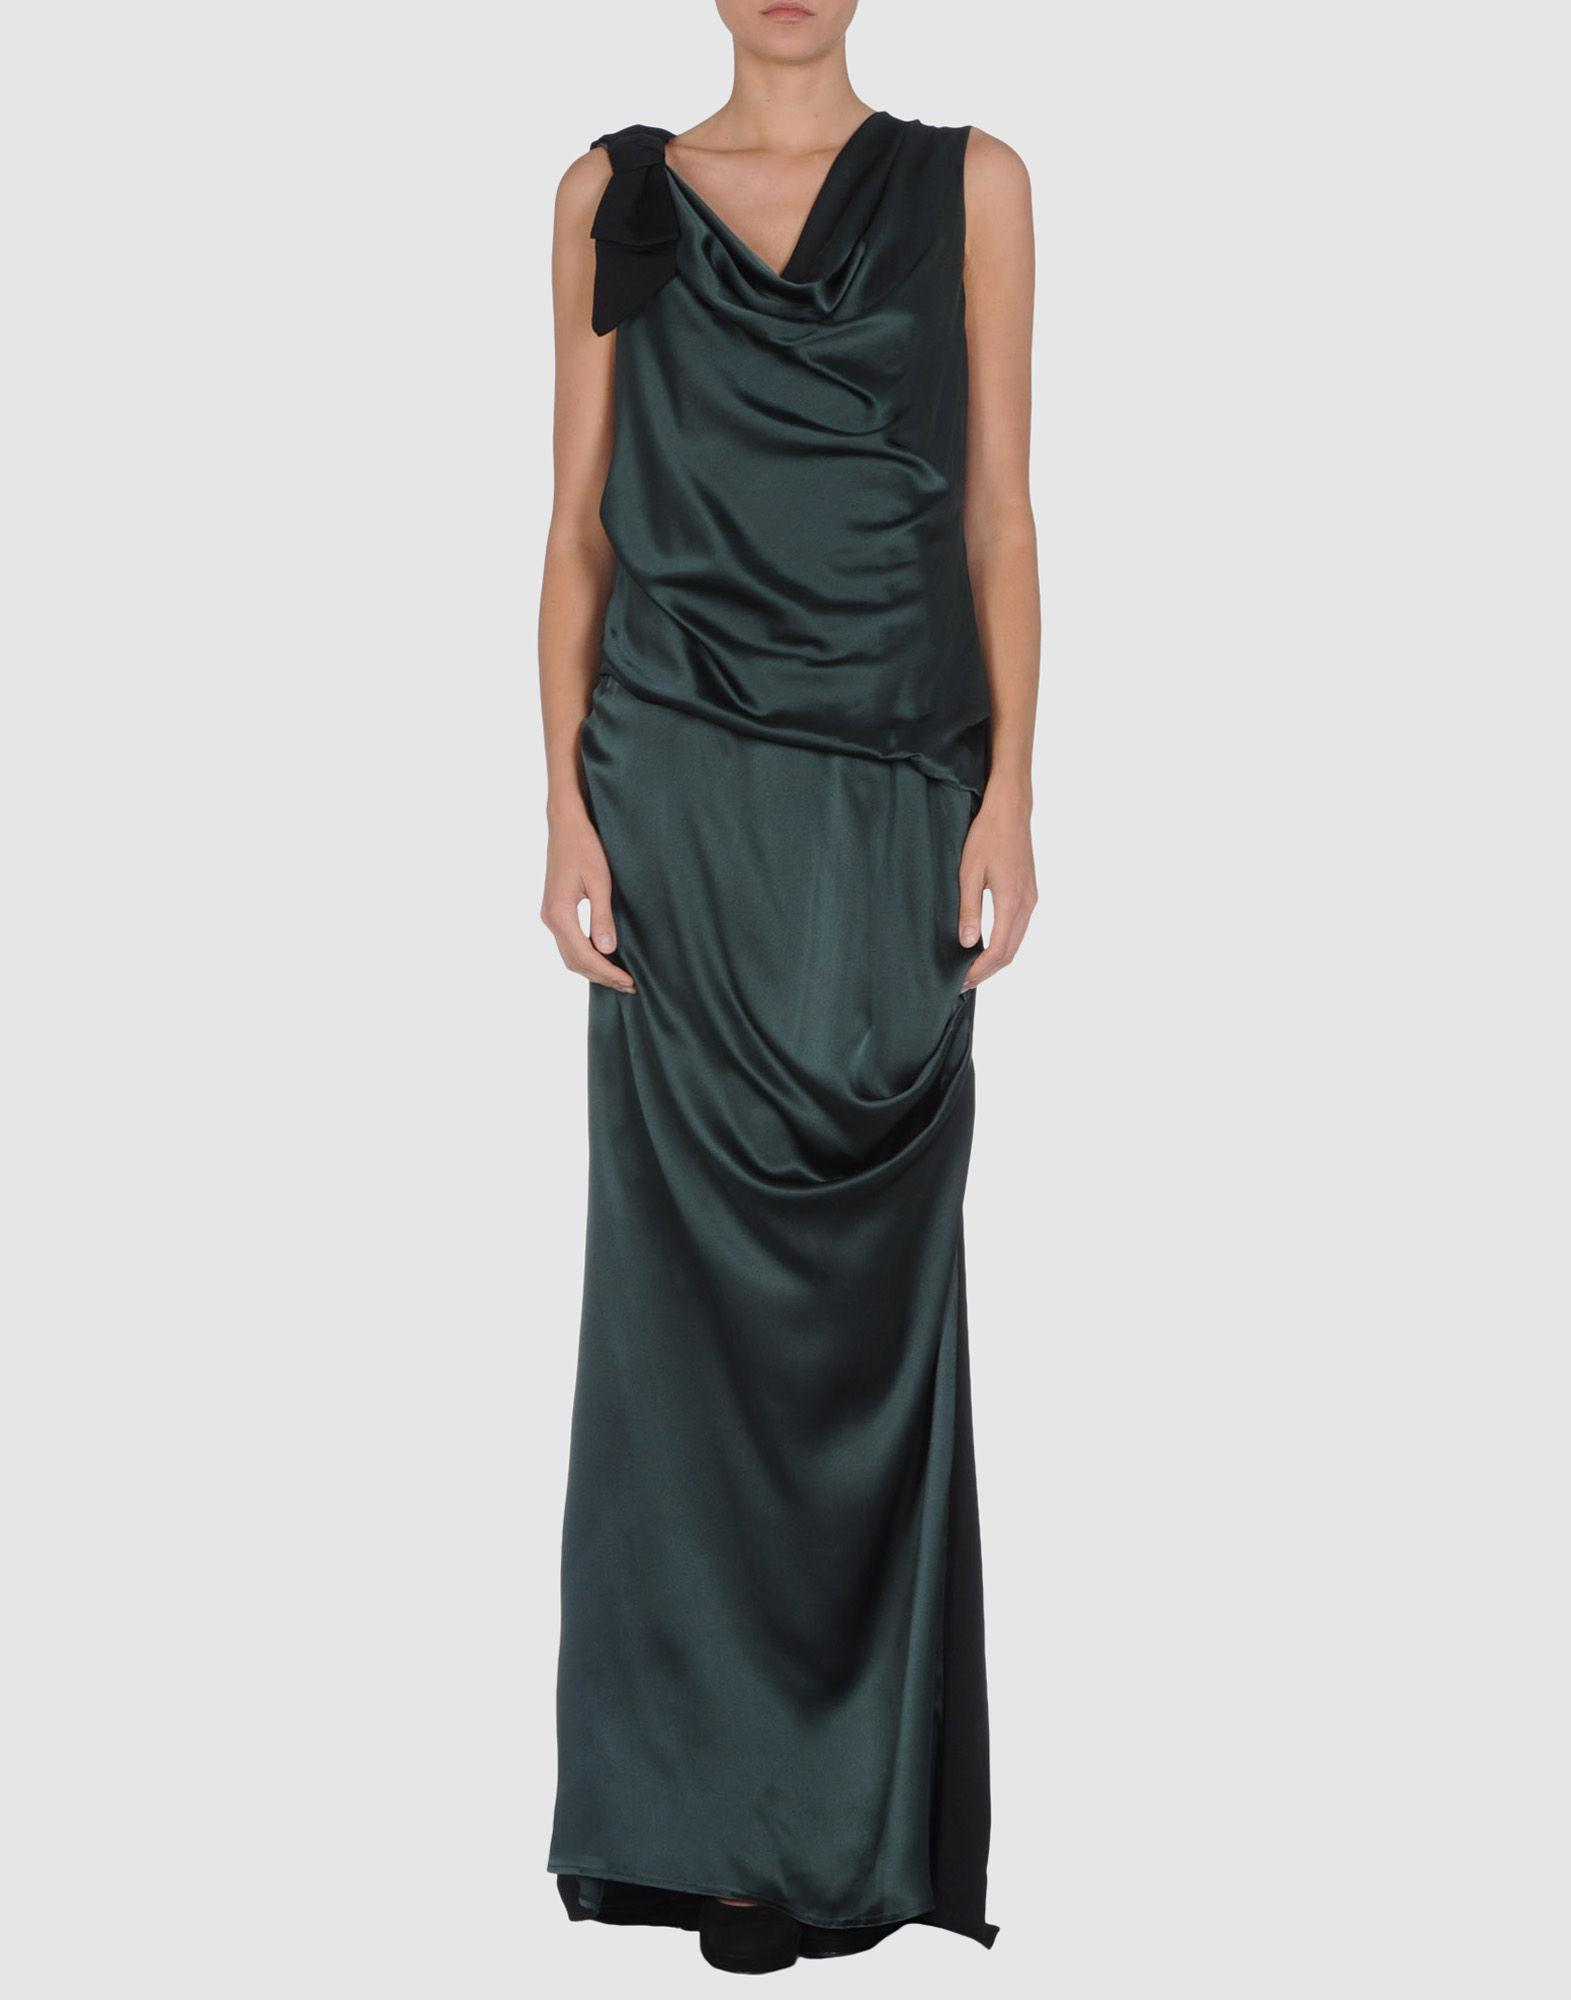 34212511XP 14 f - Evening Φορεματα Vera Wang 2011 2012 Κωδ.07